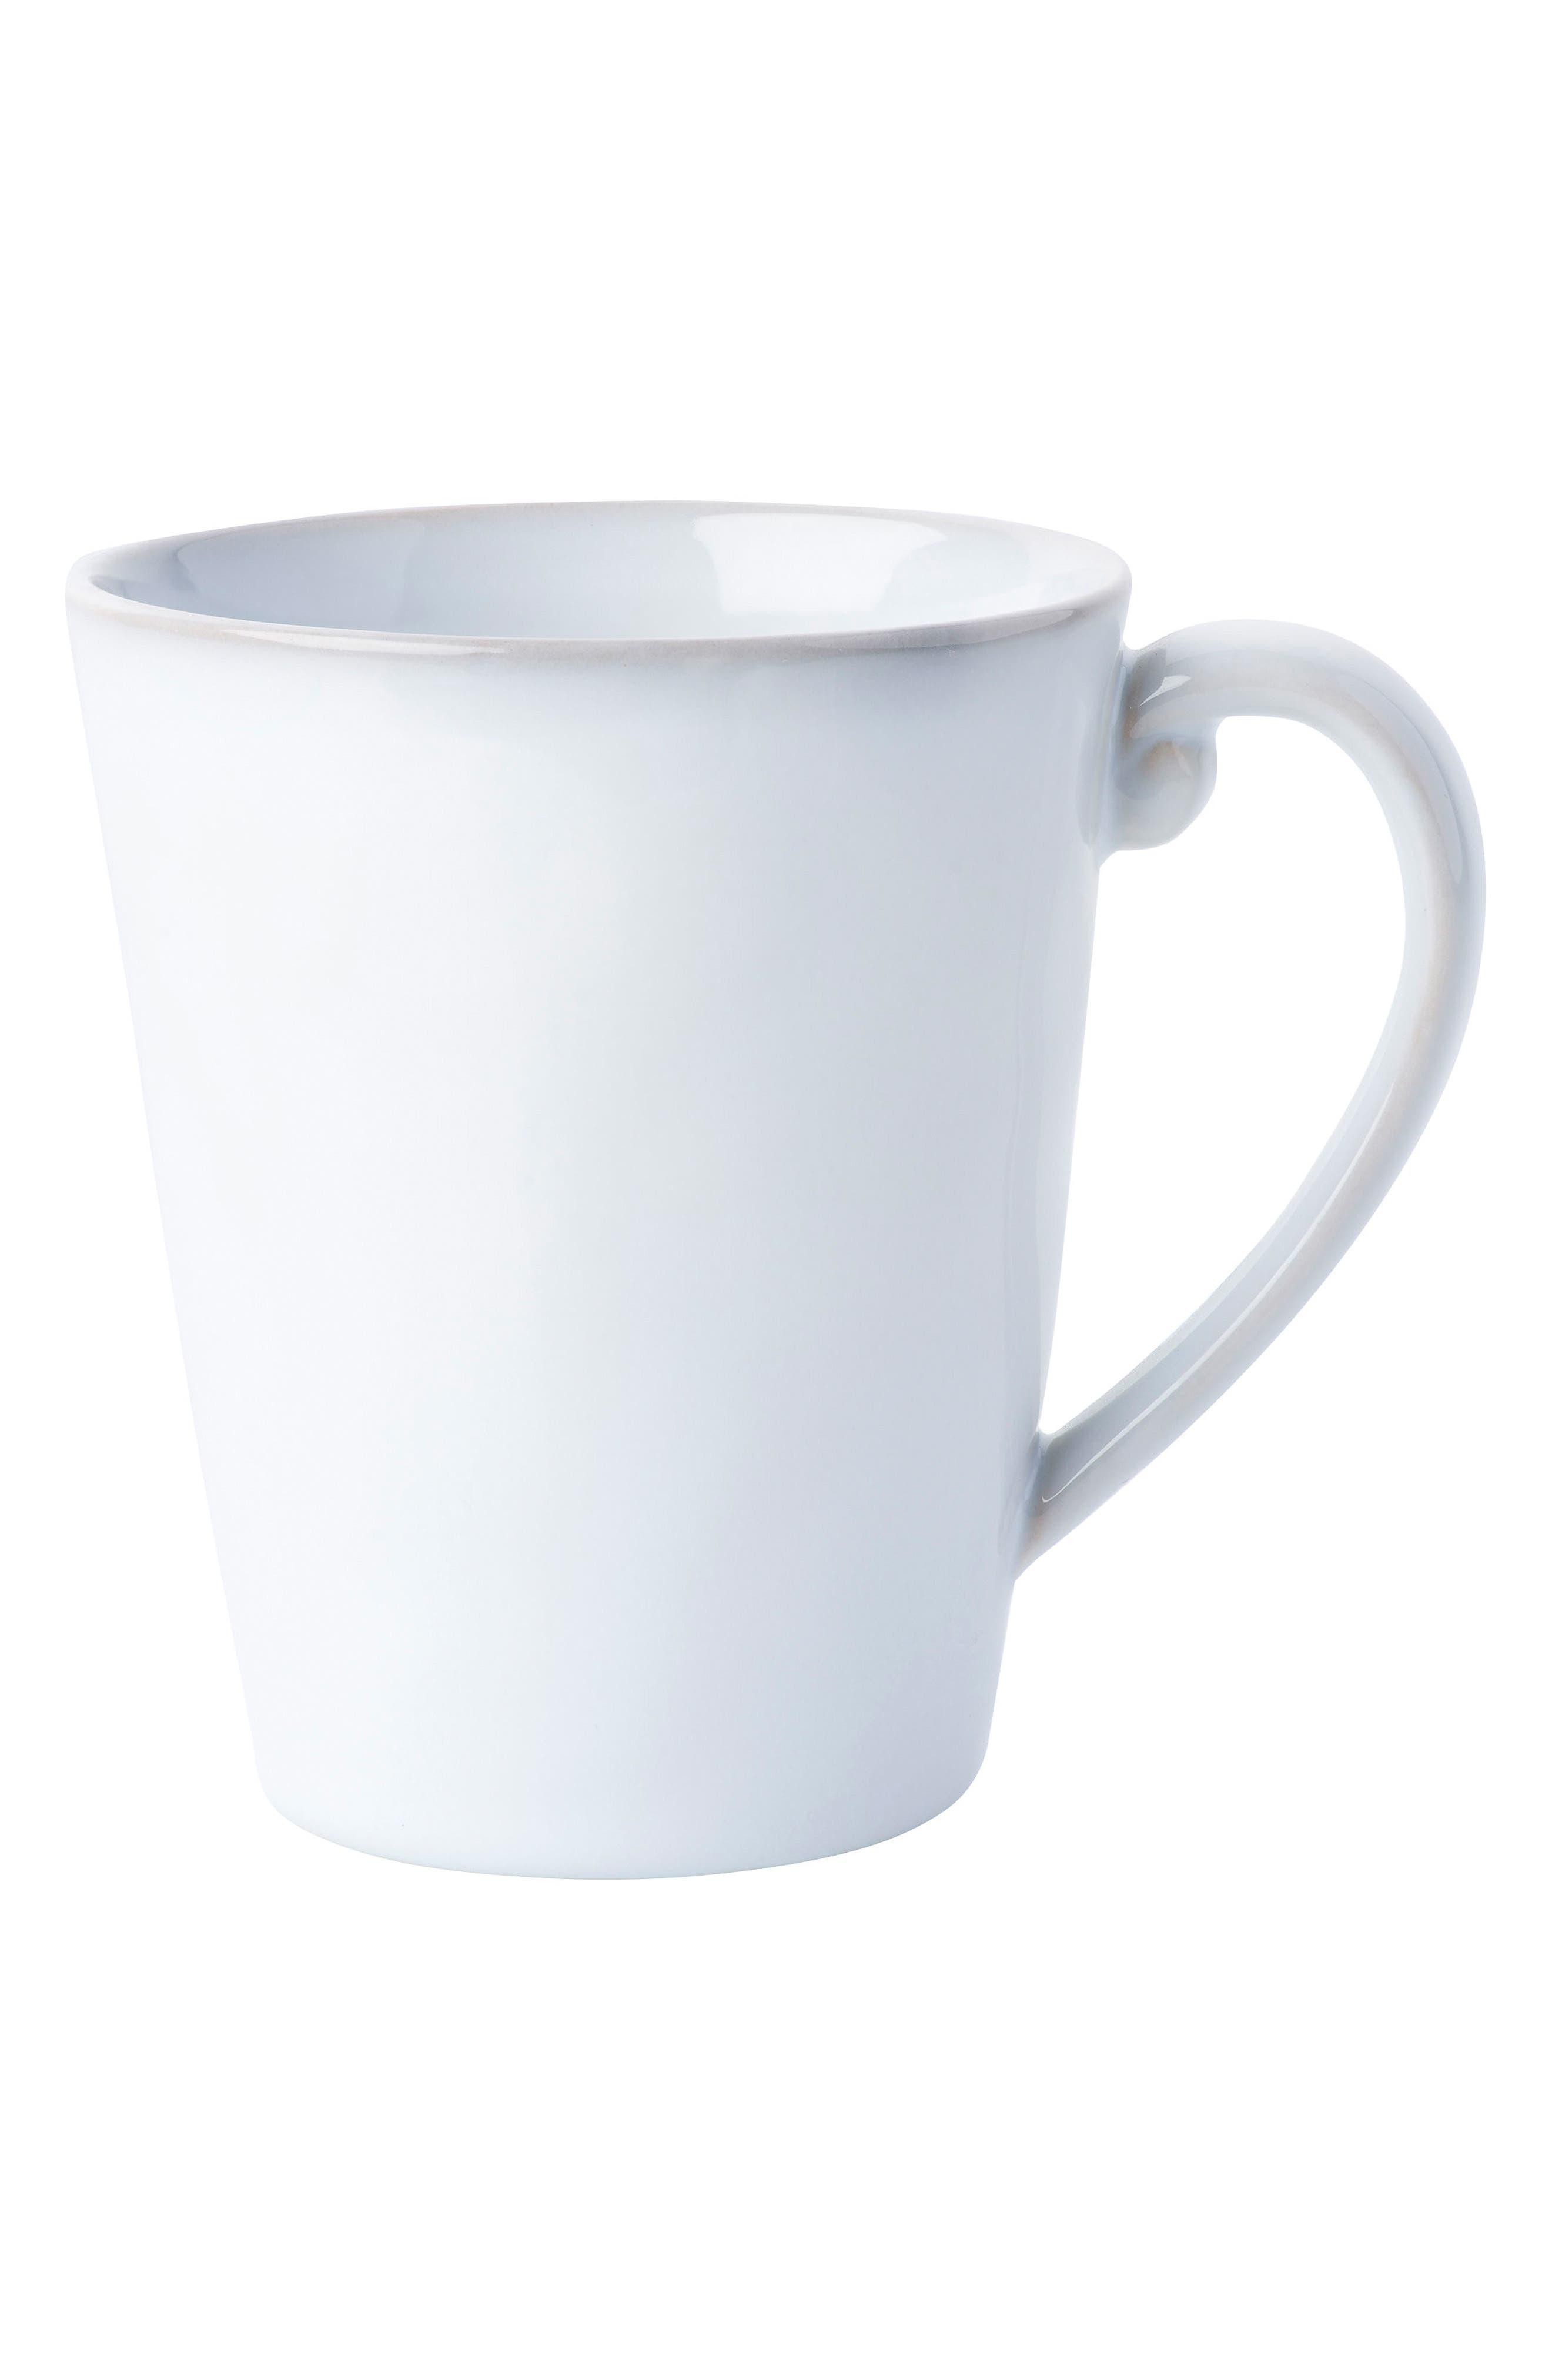 Quotidien White Truffle Ceramic Mug,                             Main thumbnail 1, color,                             WHITE TRUFFLE